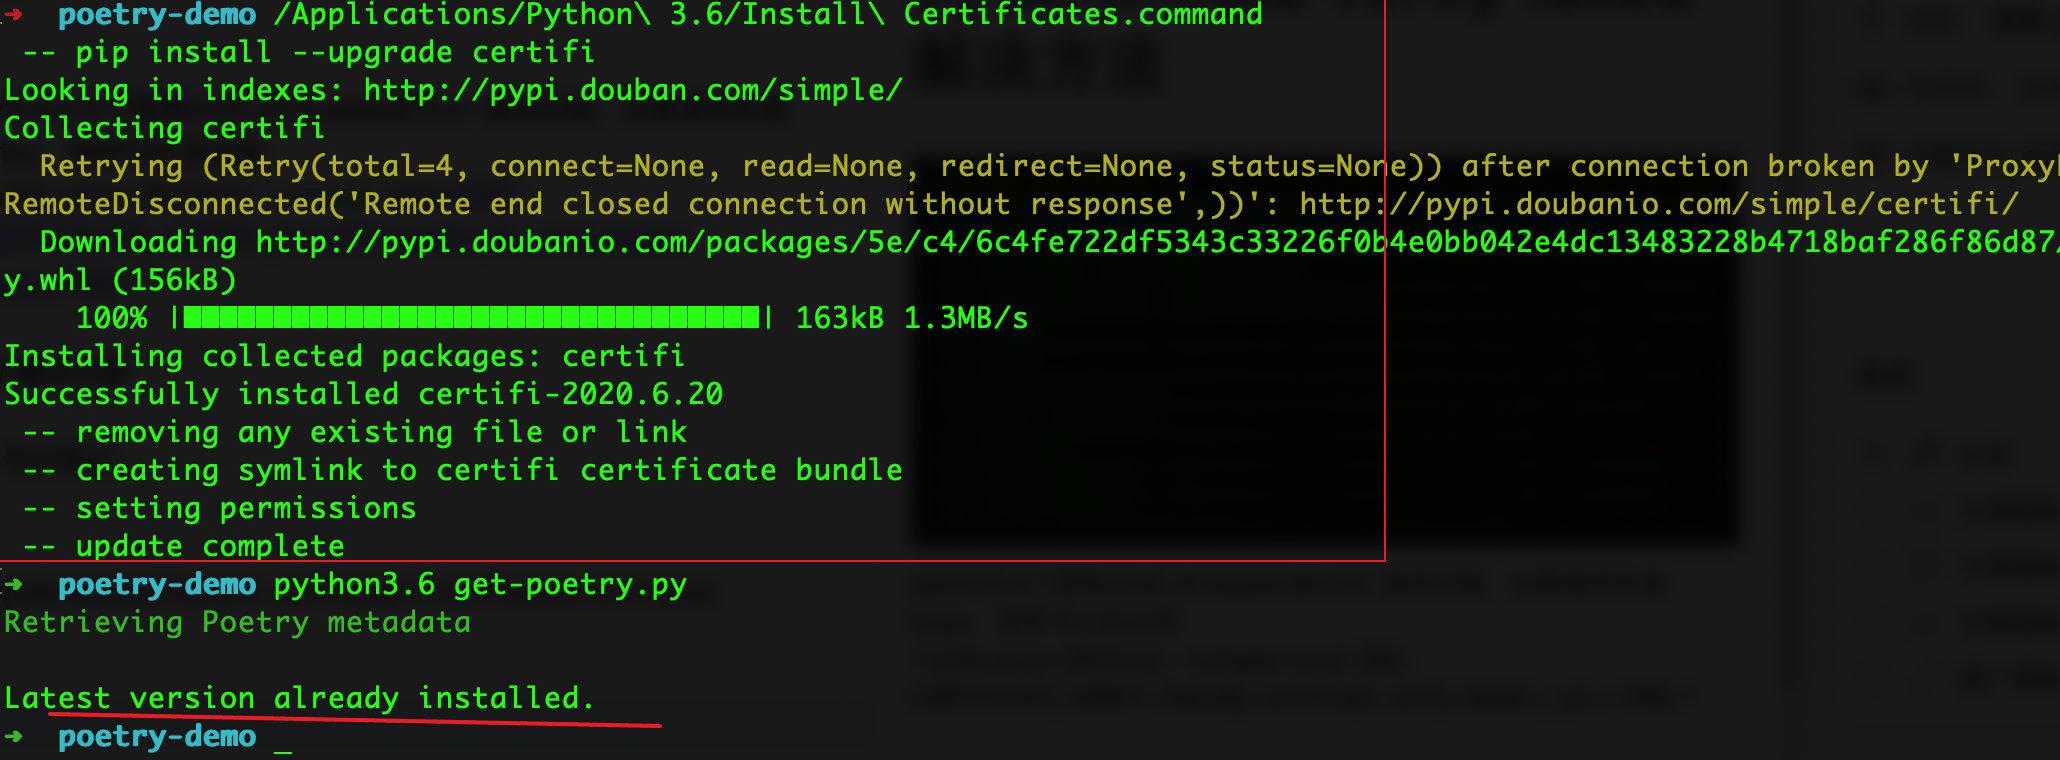 python3.6  [SSL: CERTIFICATE_VERIFY_FAILED] certificate verify failed 解决方法-Python 技术分享 Java技术分享 Python 爬虫技术_微信公众号:zeropython—昊天博客